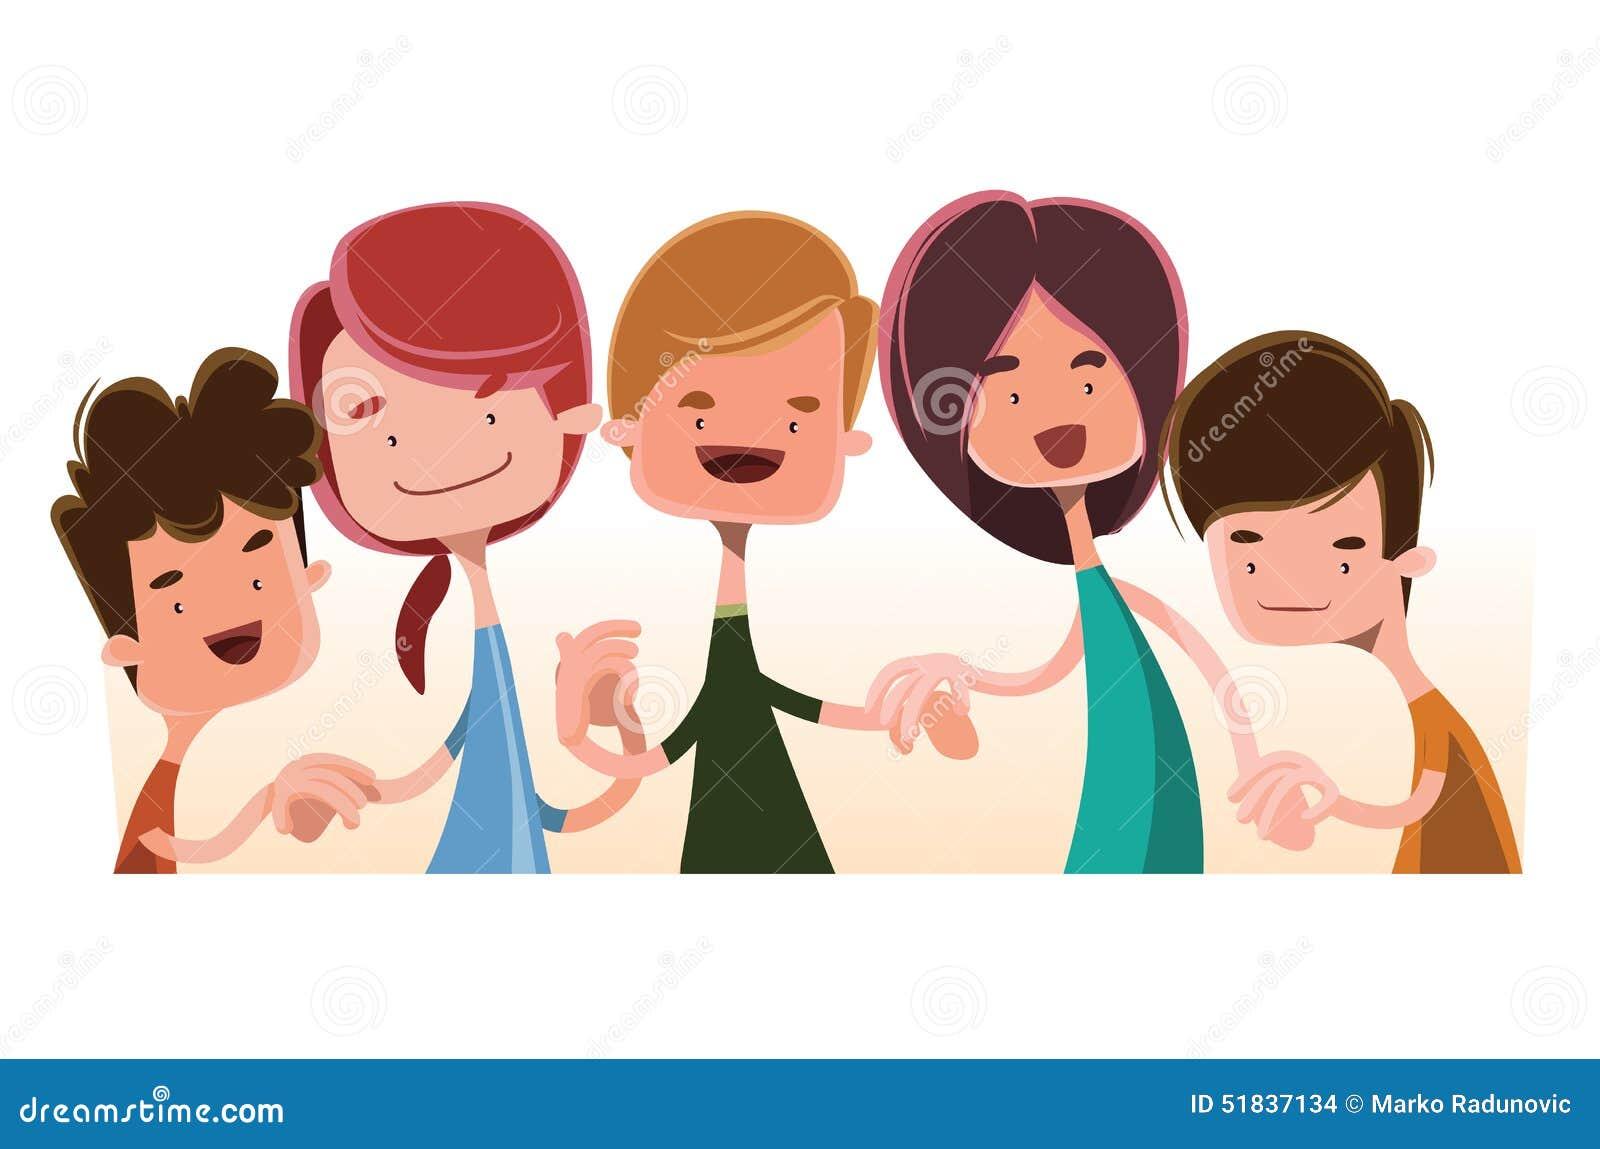 Cartoon Characters Holding Hands : Children holding hands illustration cartoon character